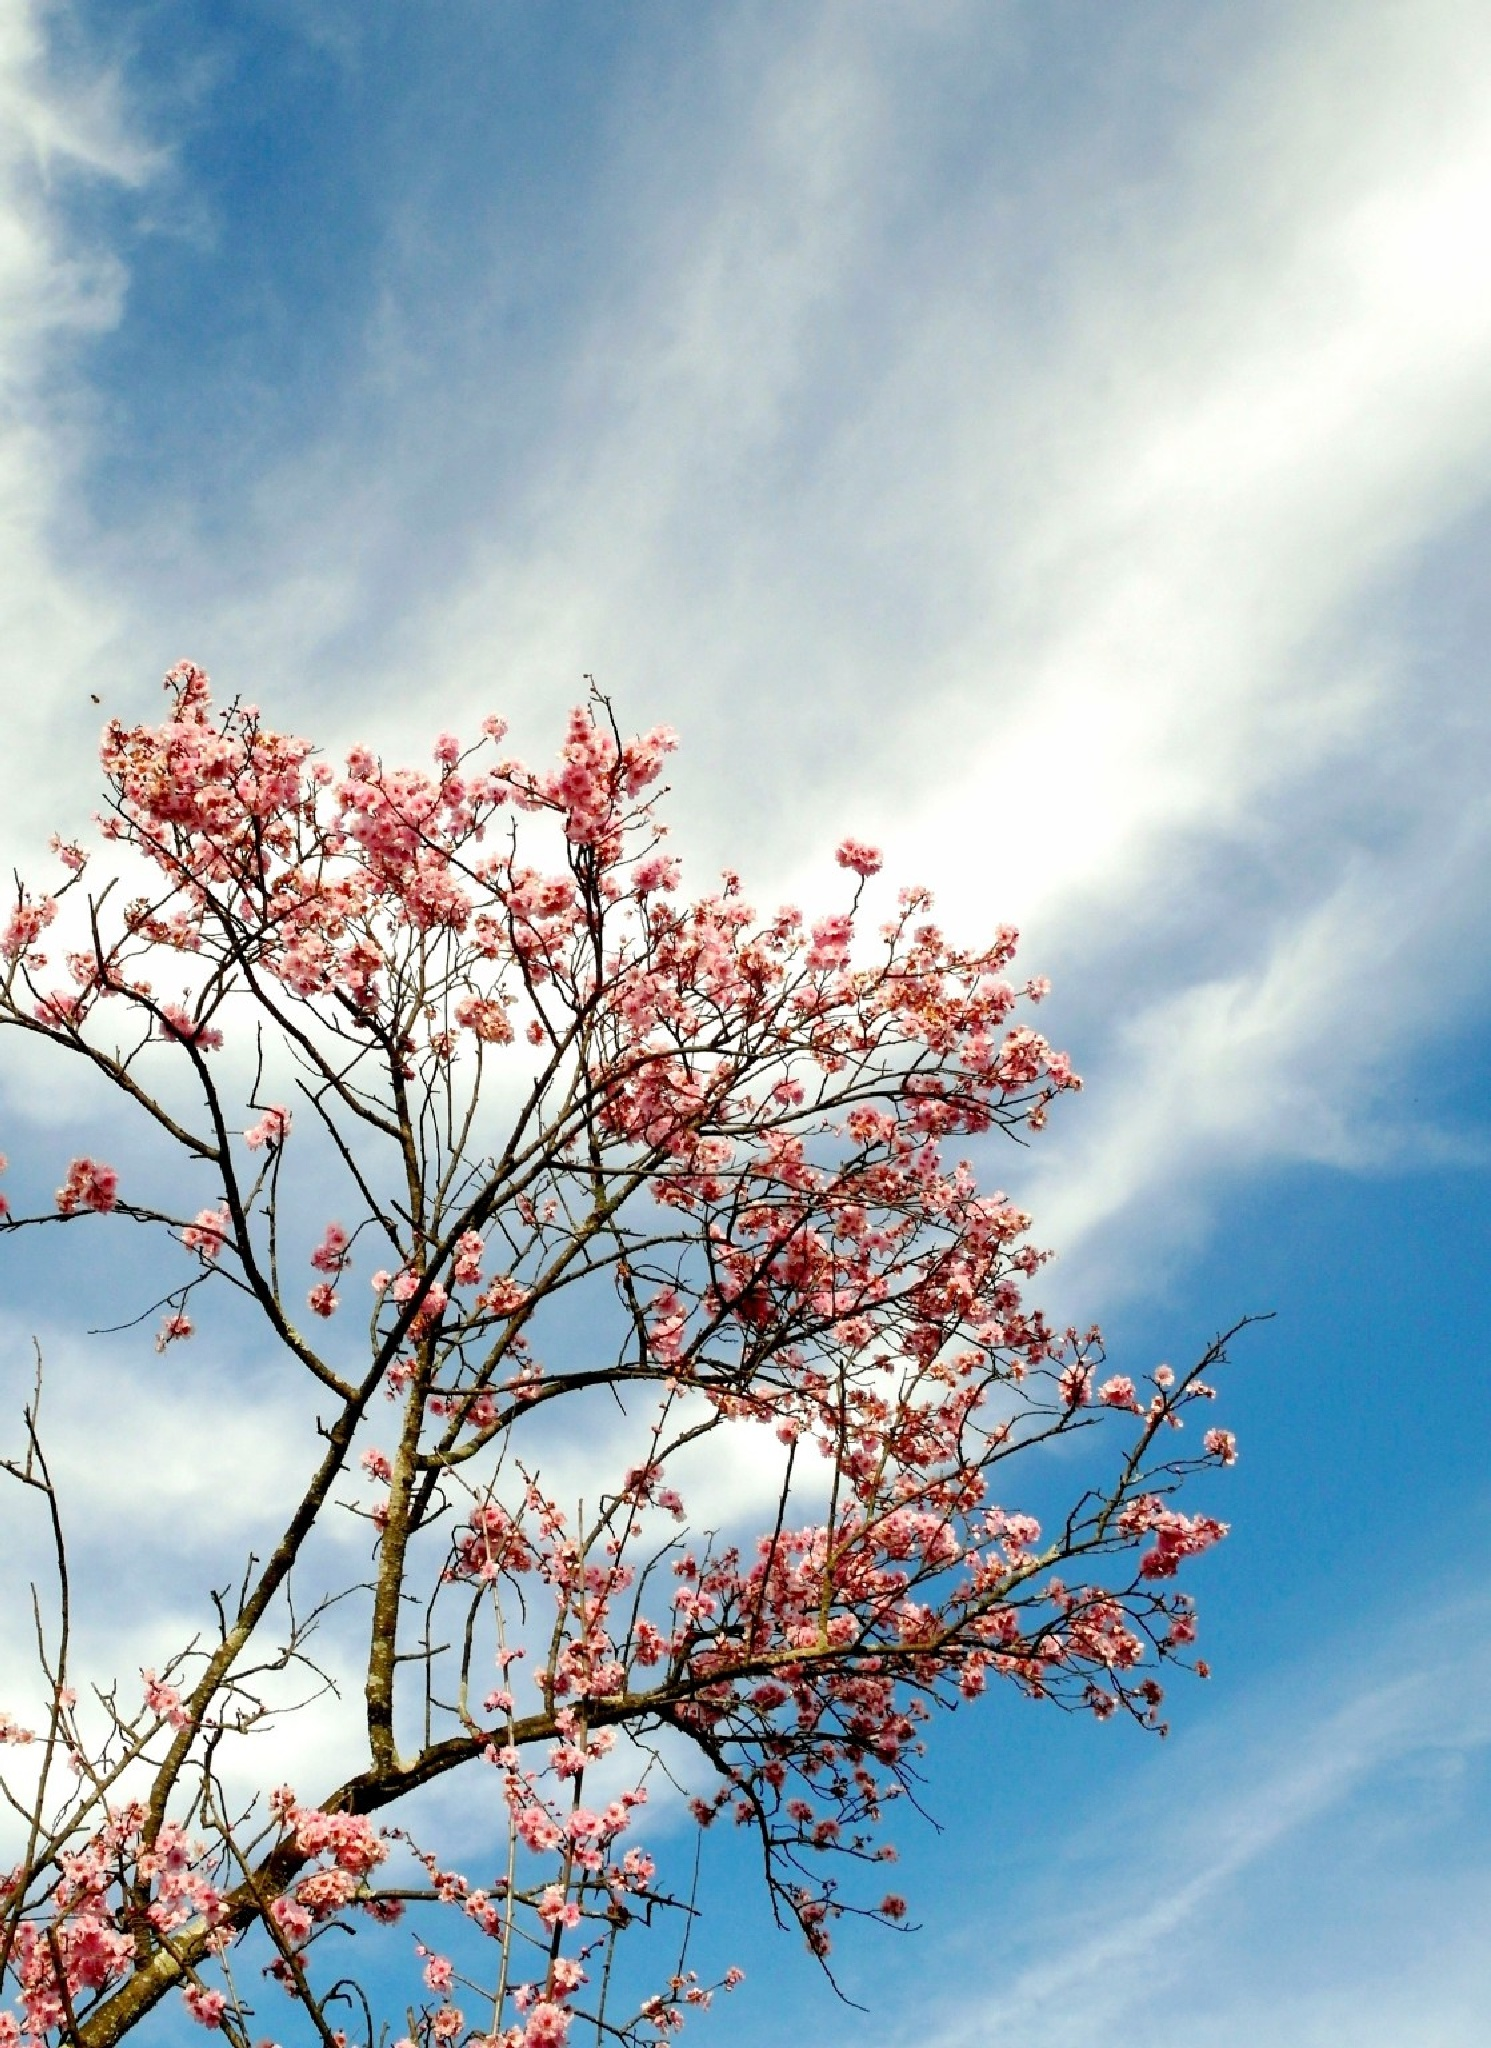 Cherry blossom at Auburn Garden by pop88123